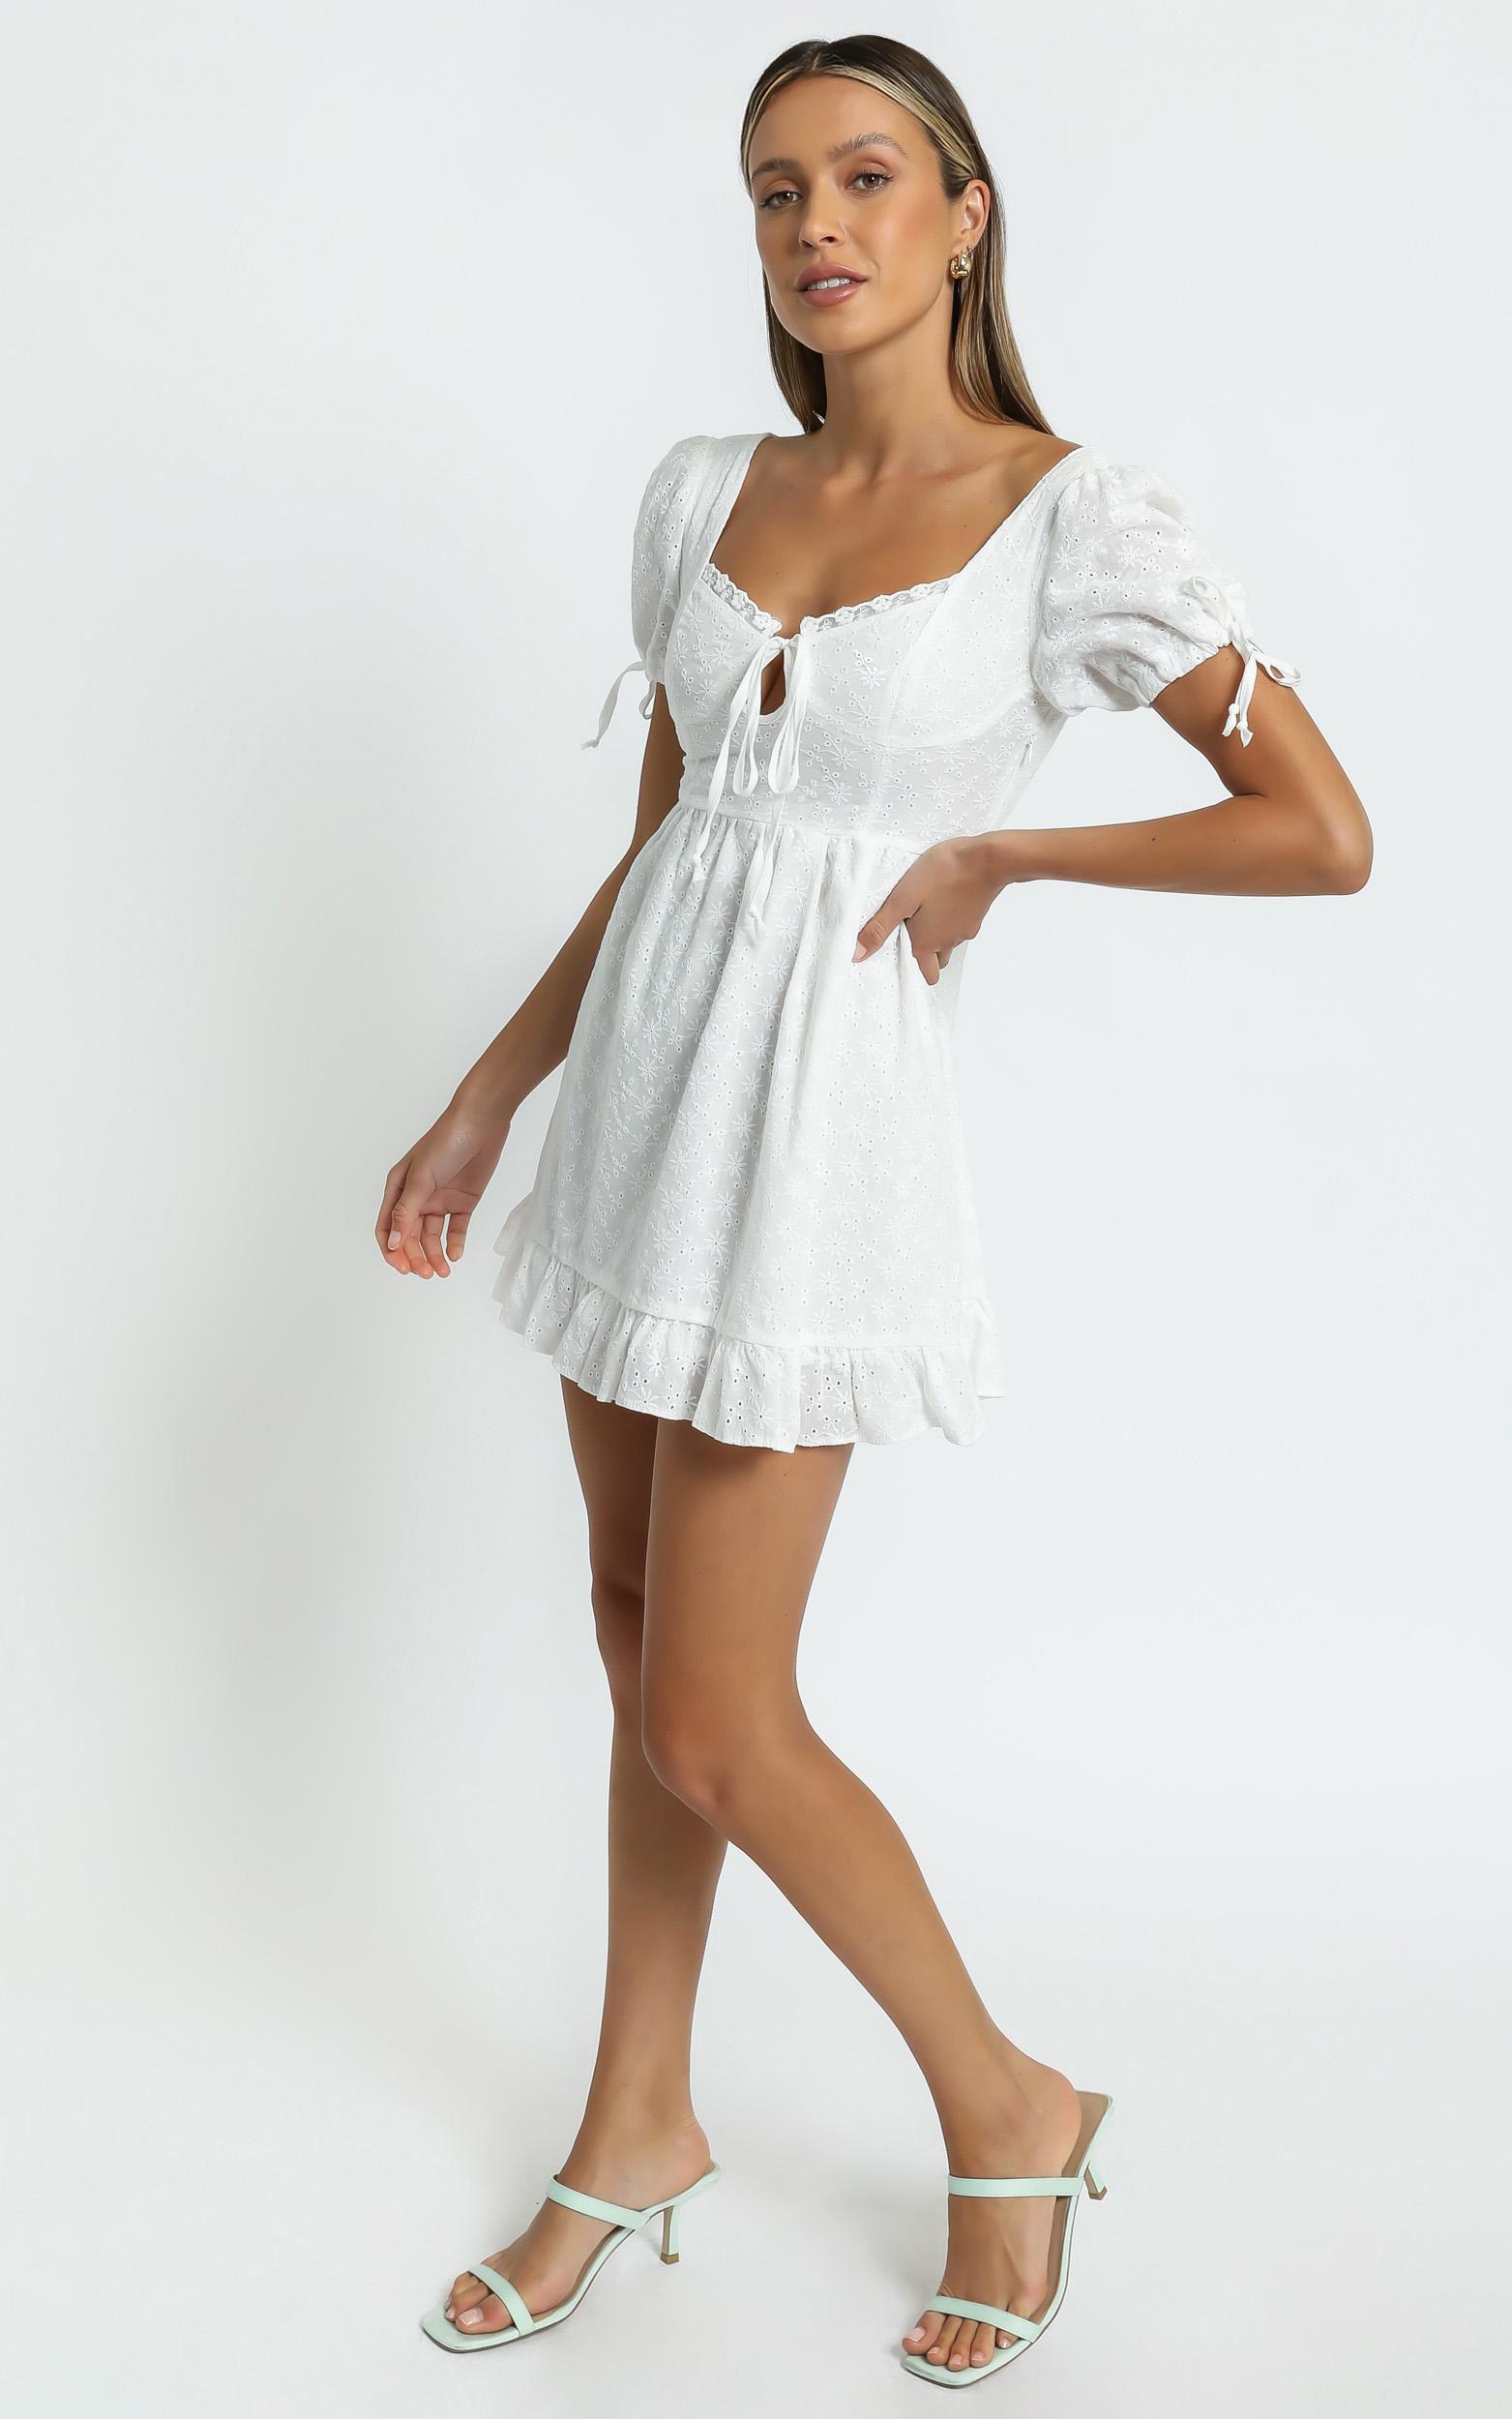 Perla Dress in White - 8 (S), White, hi-res image number null